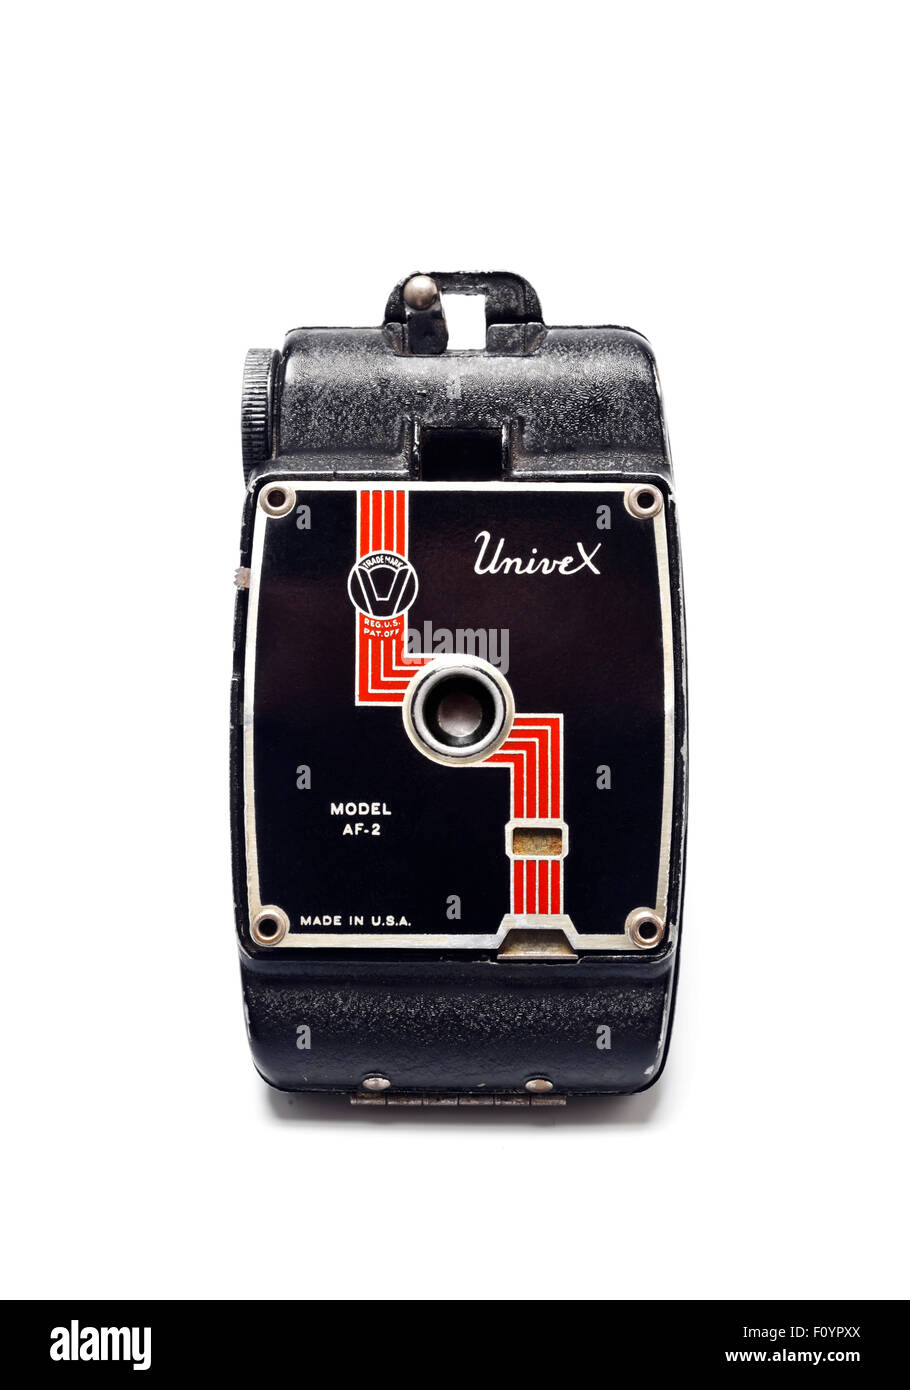 The Univex AF-2 Miniature Film folding spy Camera - Stock Image